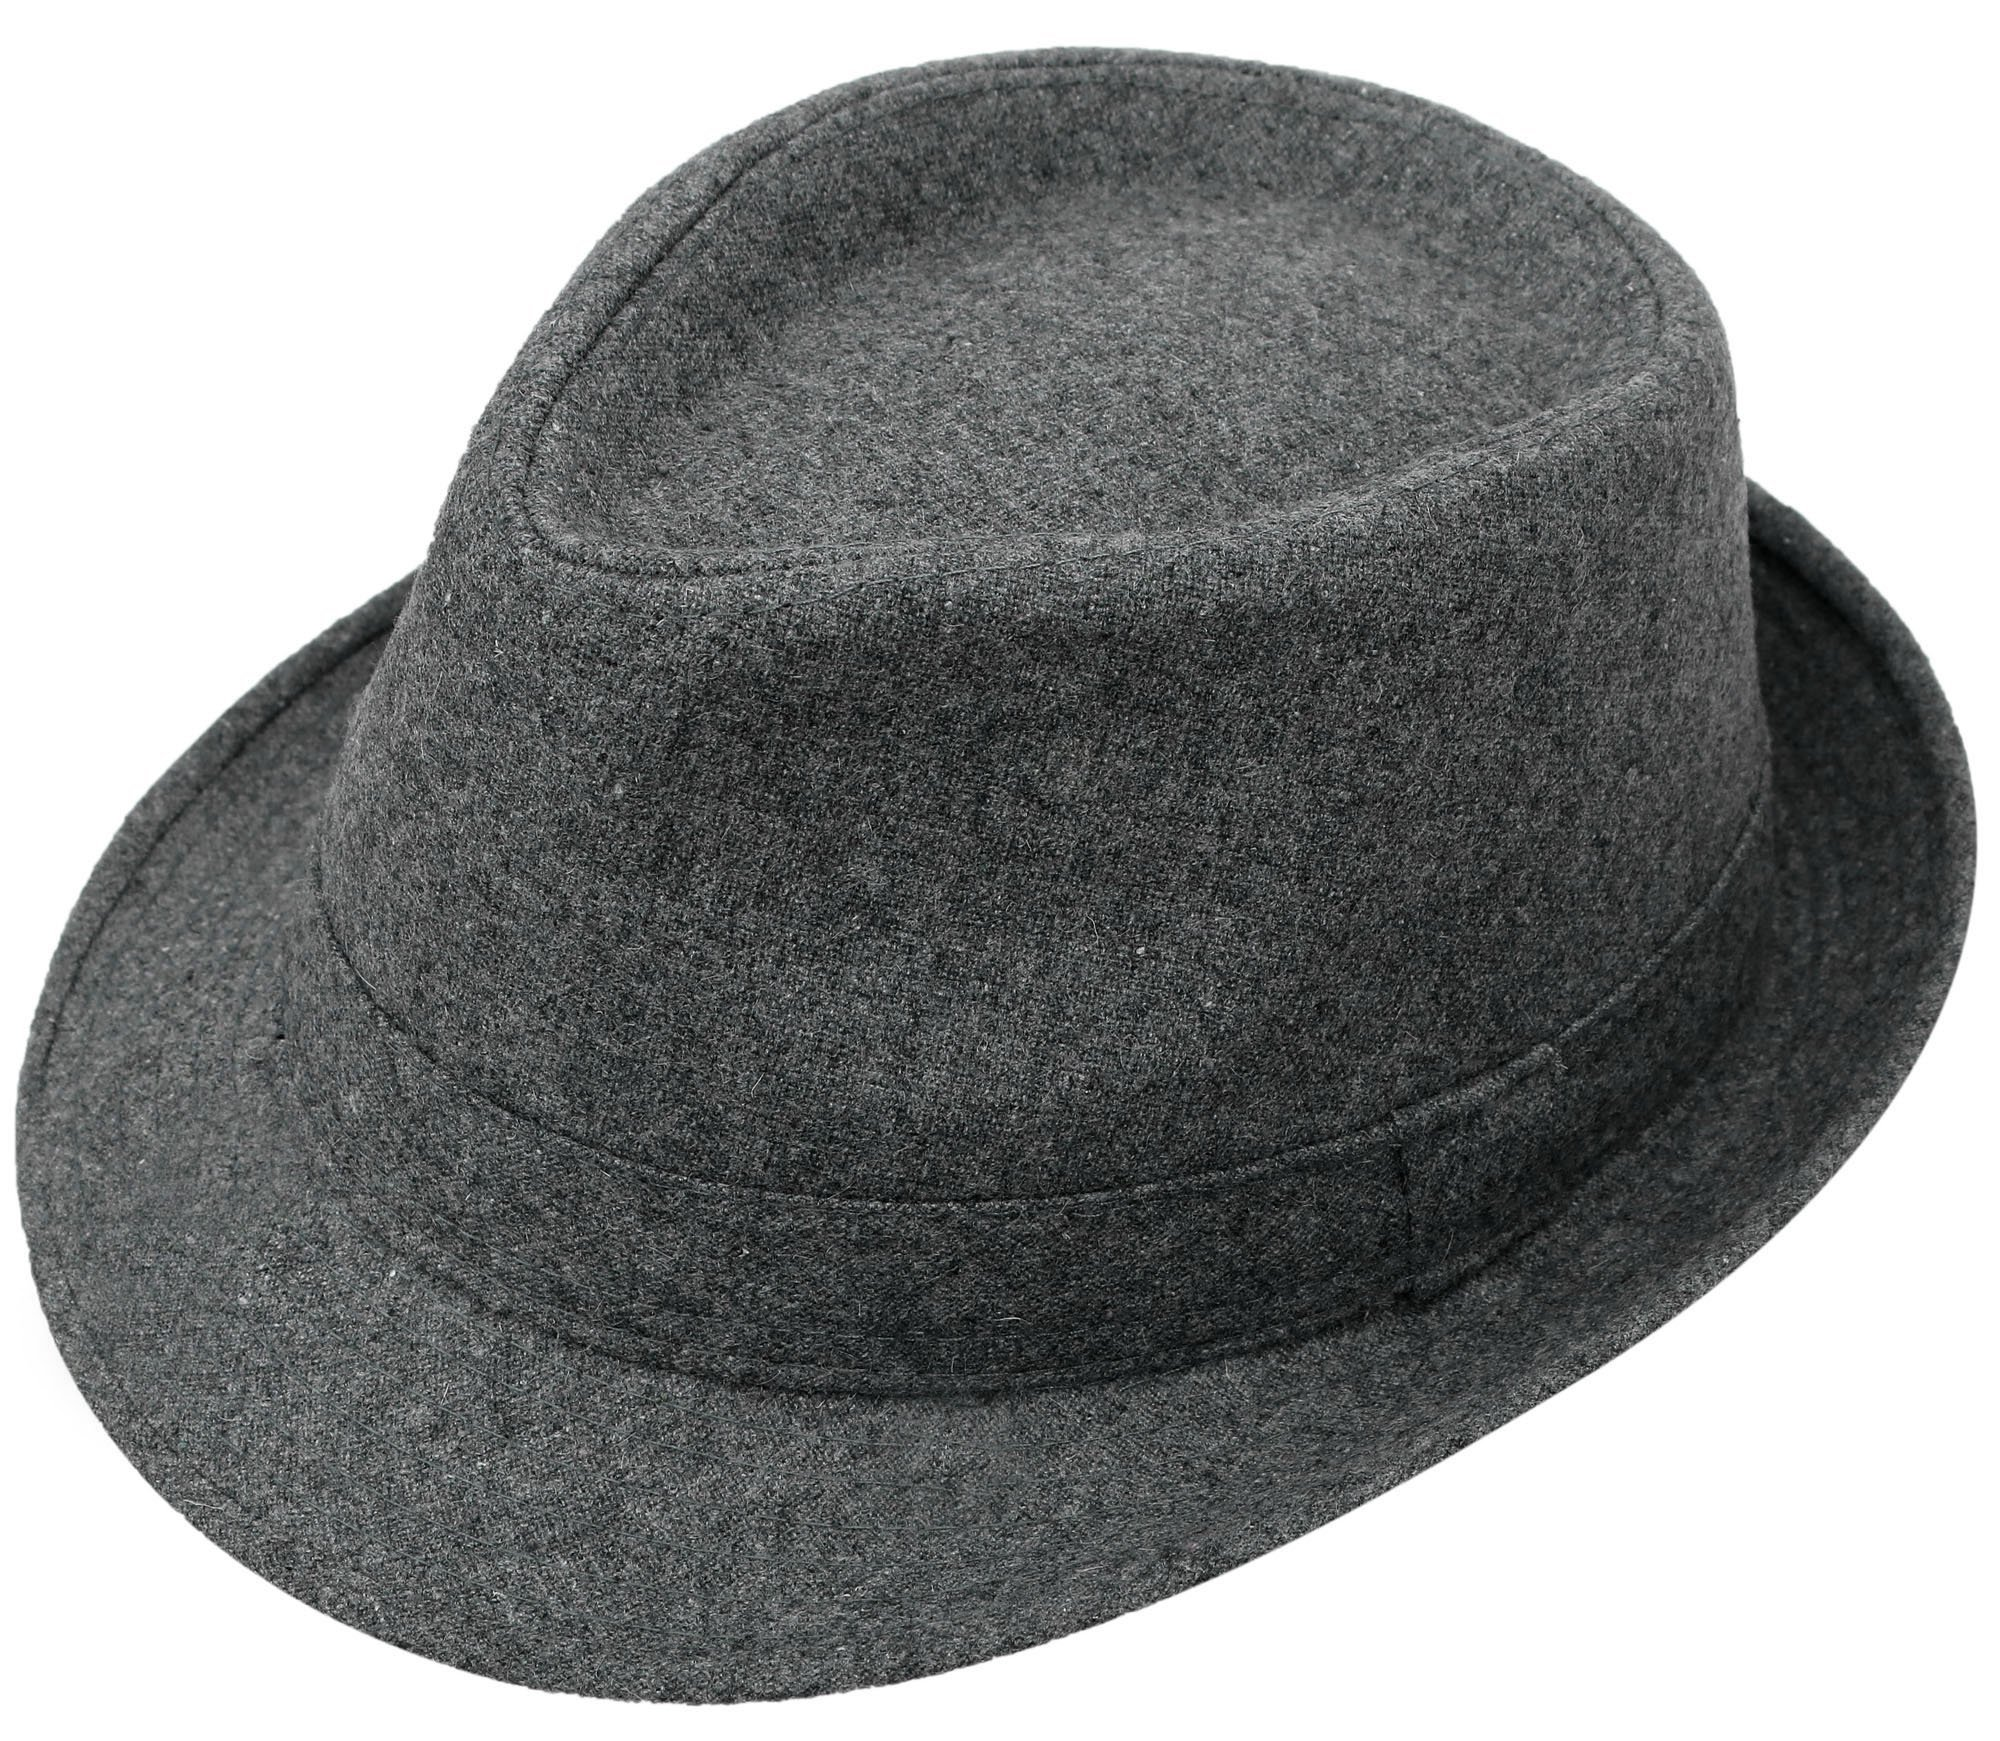 KEA KEA Vintage Unisex Fedora Hat Classic Timeless Lightweight Fedora Hat Grey by KEA KEA (Image #1)